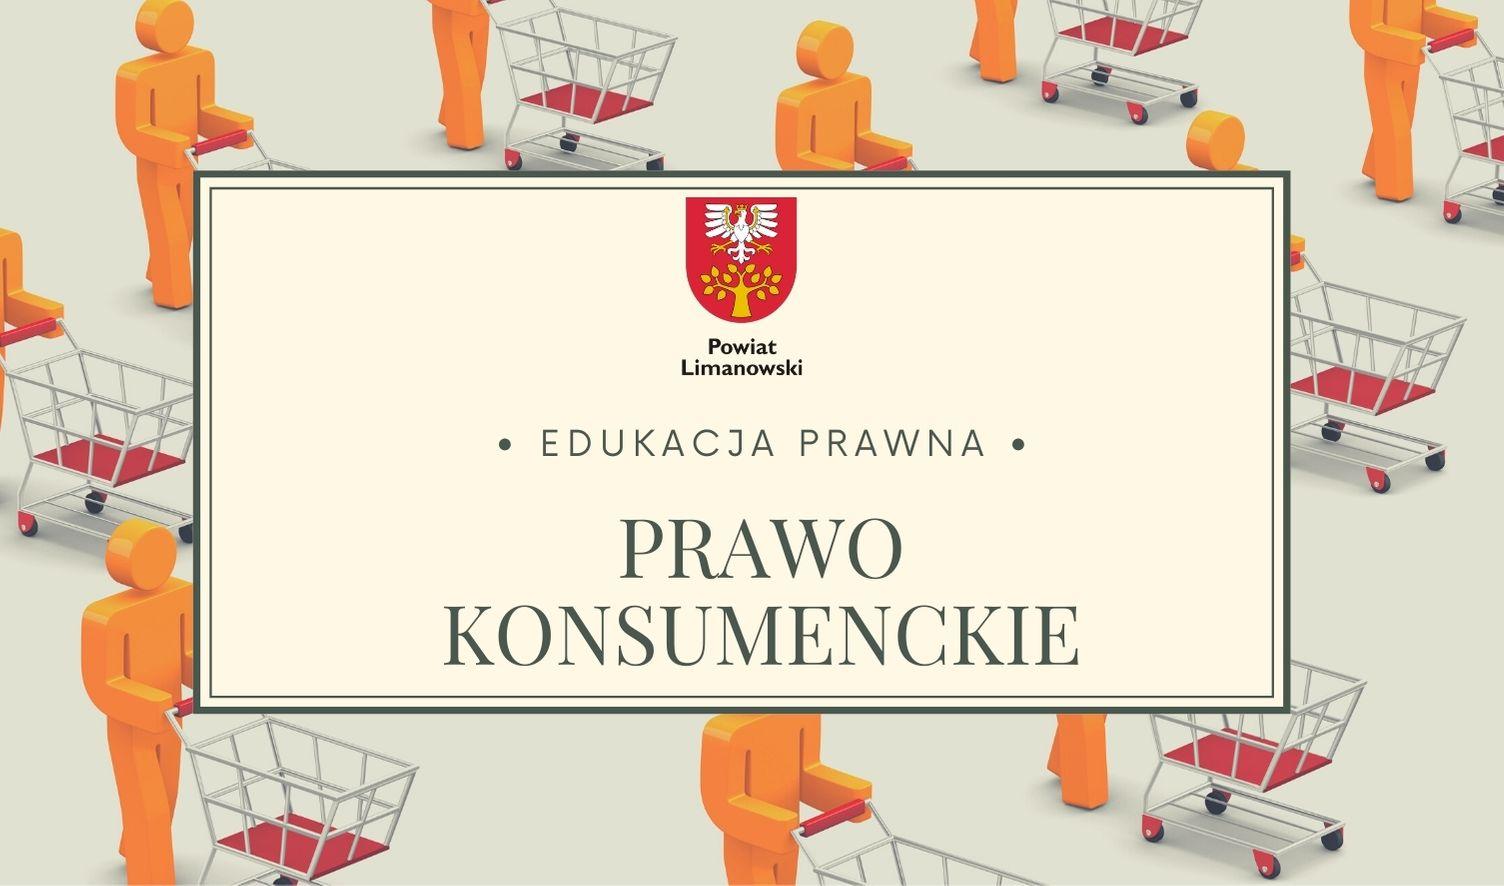 Plakat - edukacja prawna - prawo konsumenckie